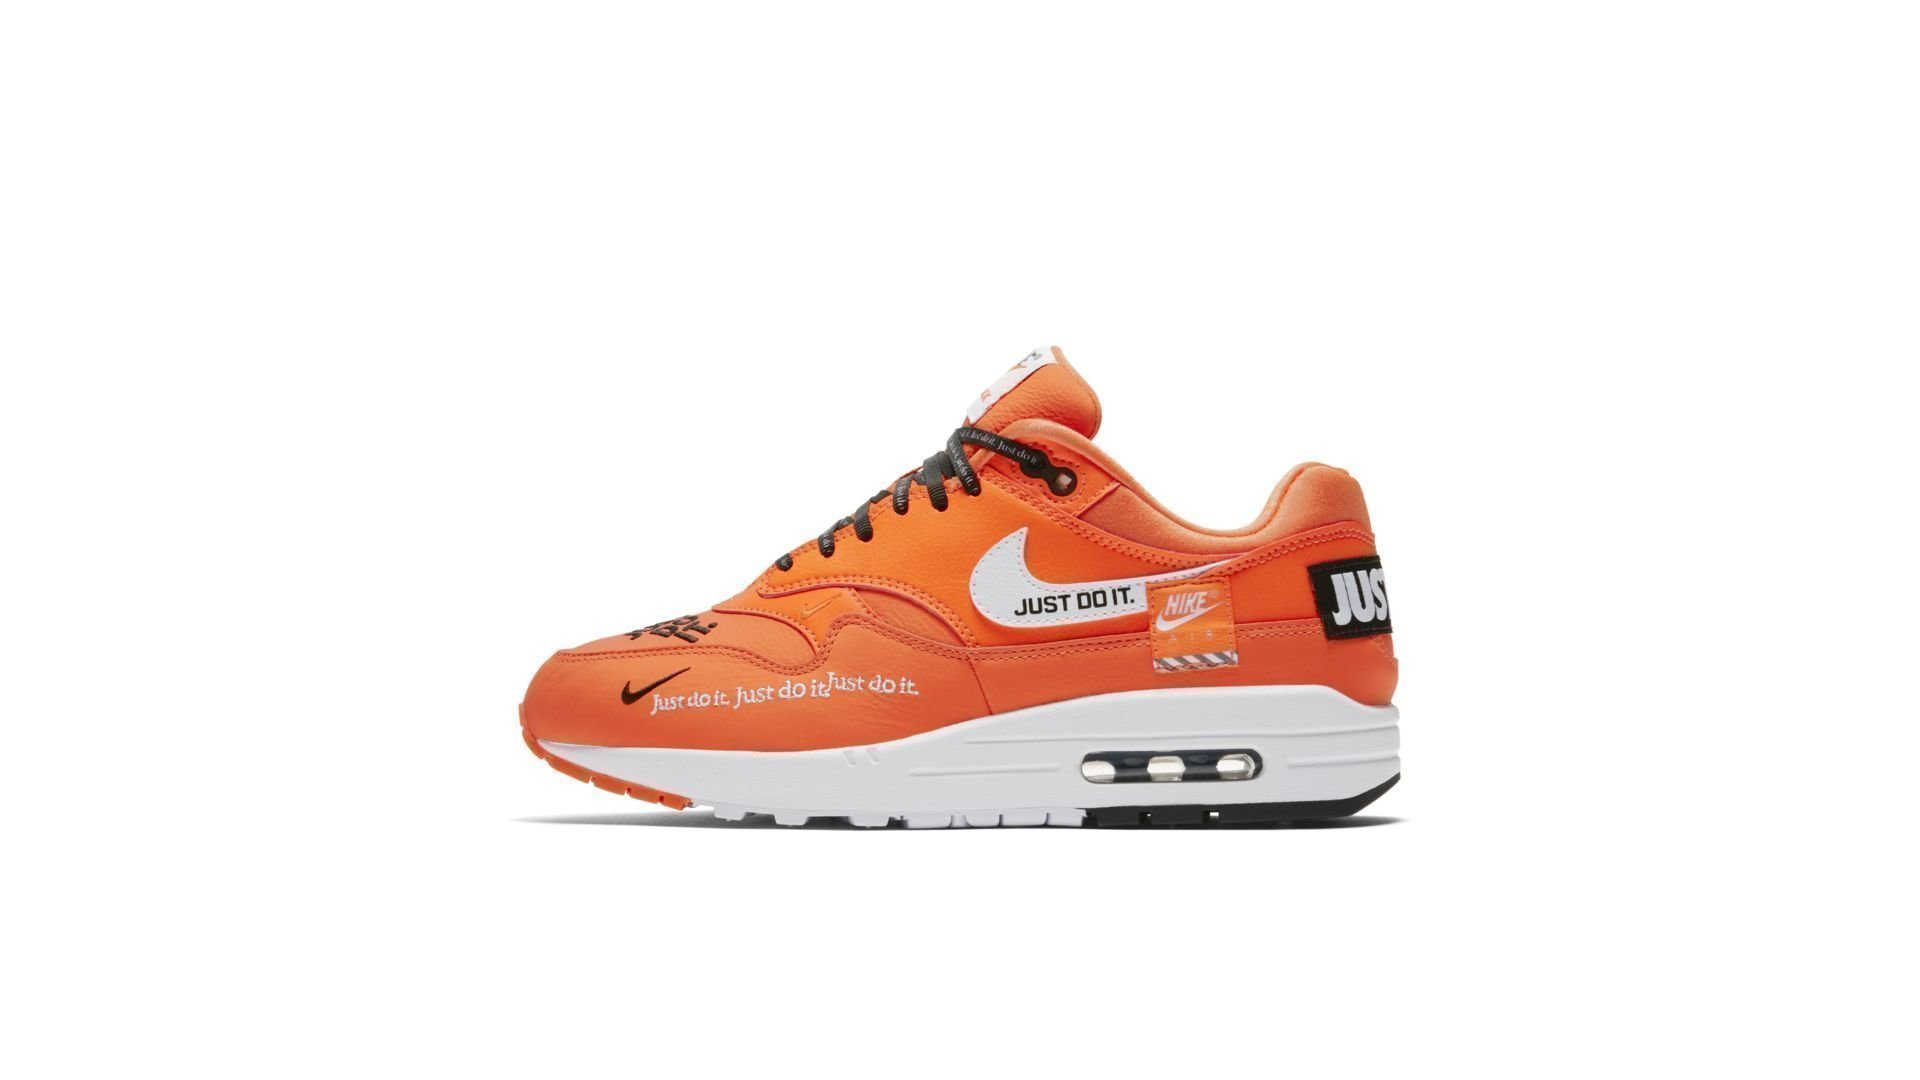 Nike WMNS Air Max 1 Lux ´Orange' (917691-800)